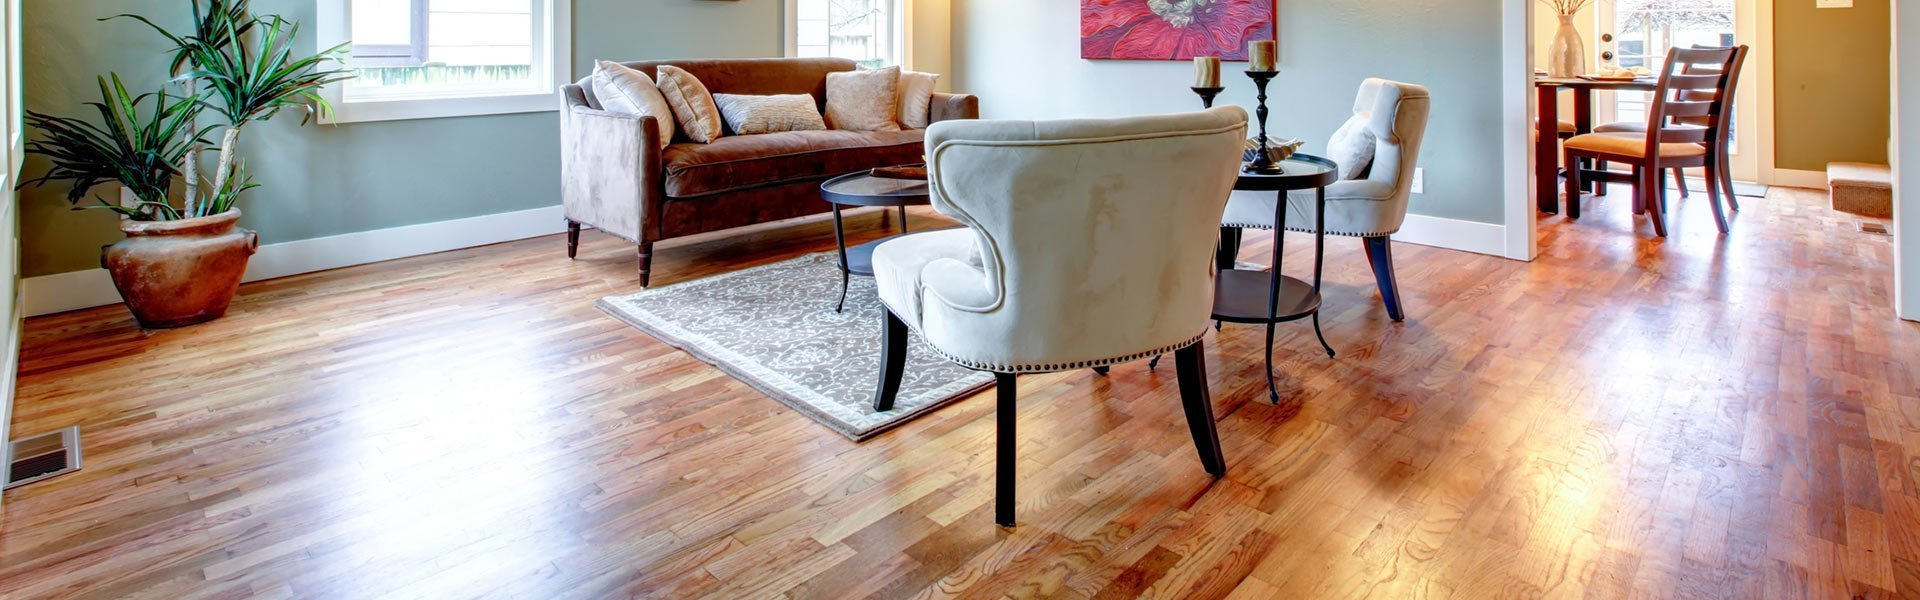 panther timber hardware interior floor